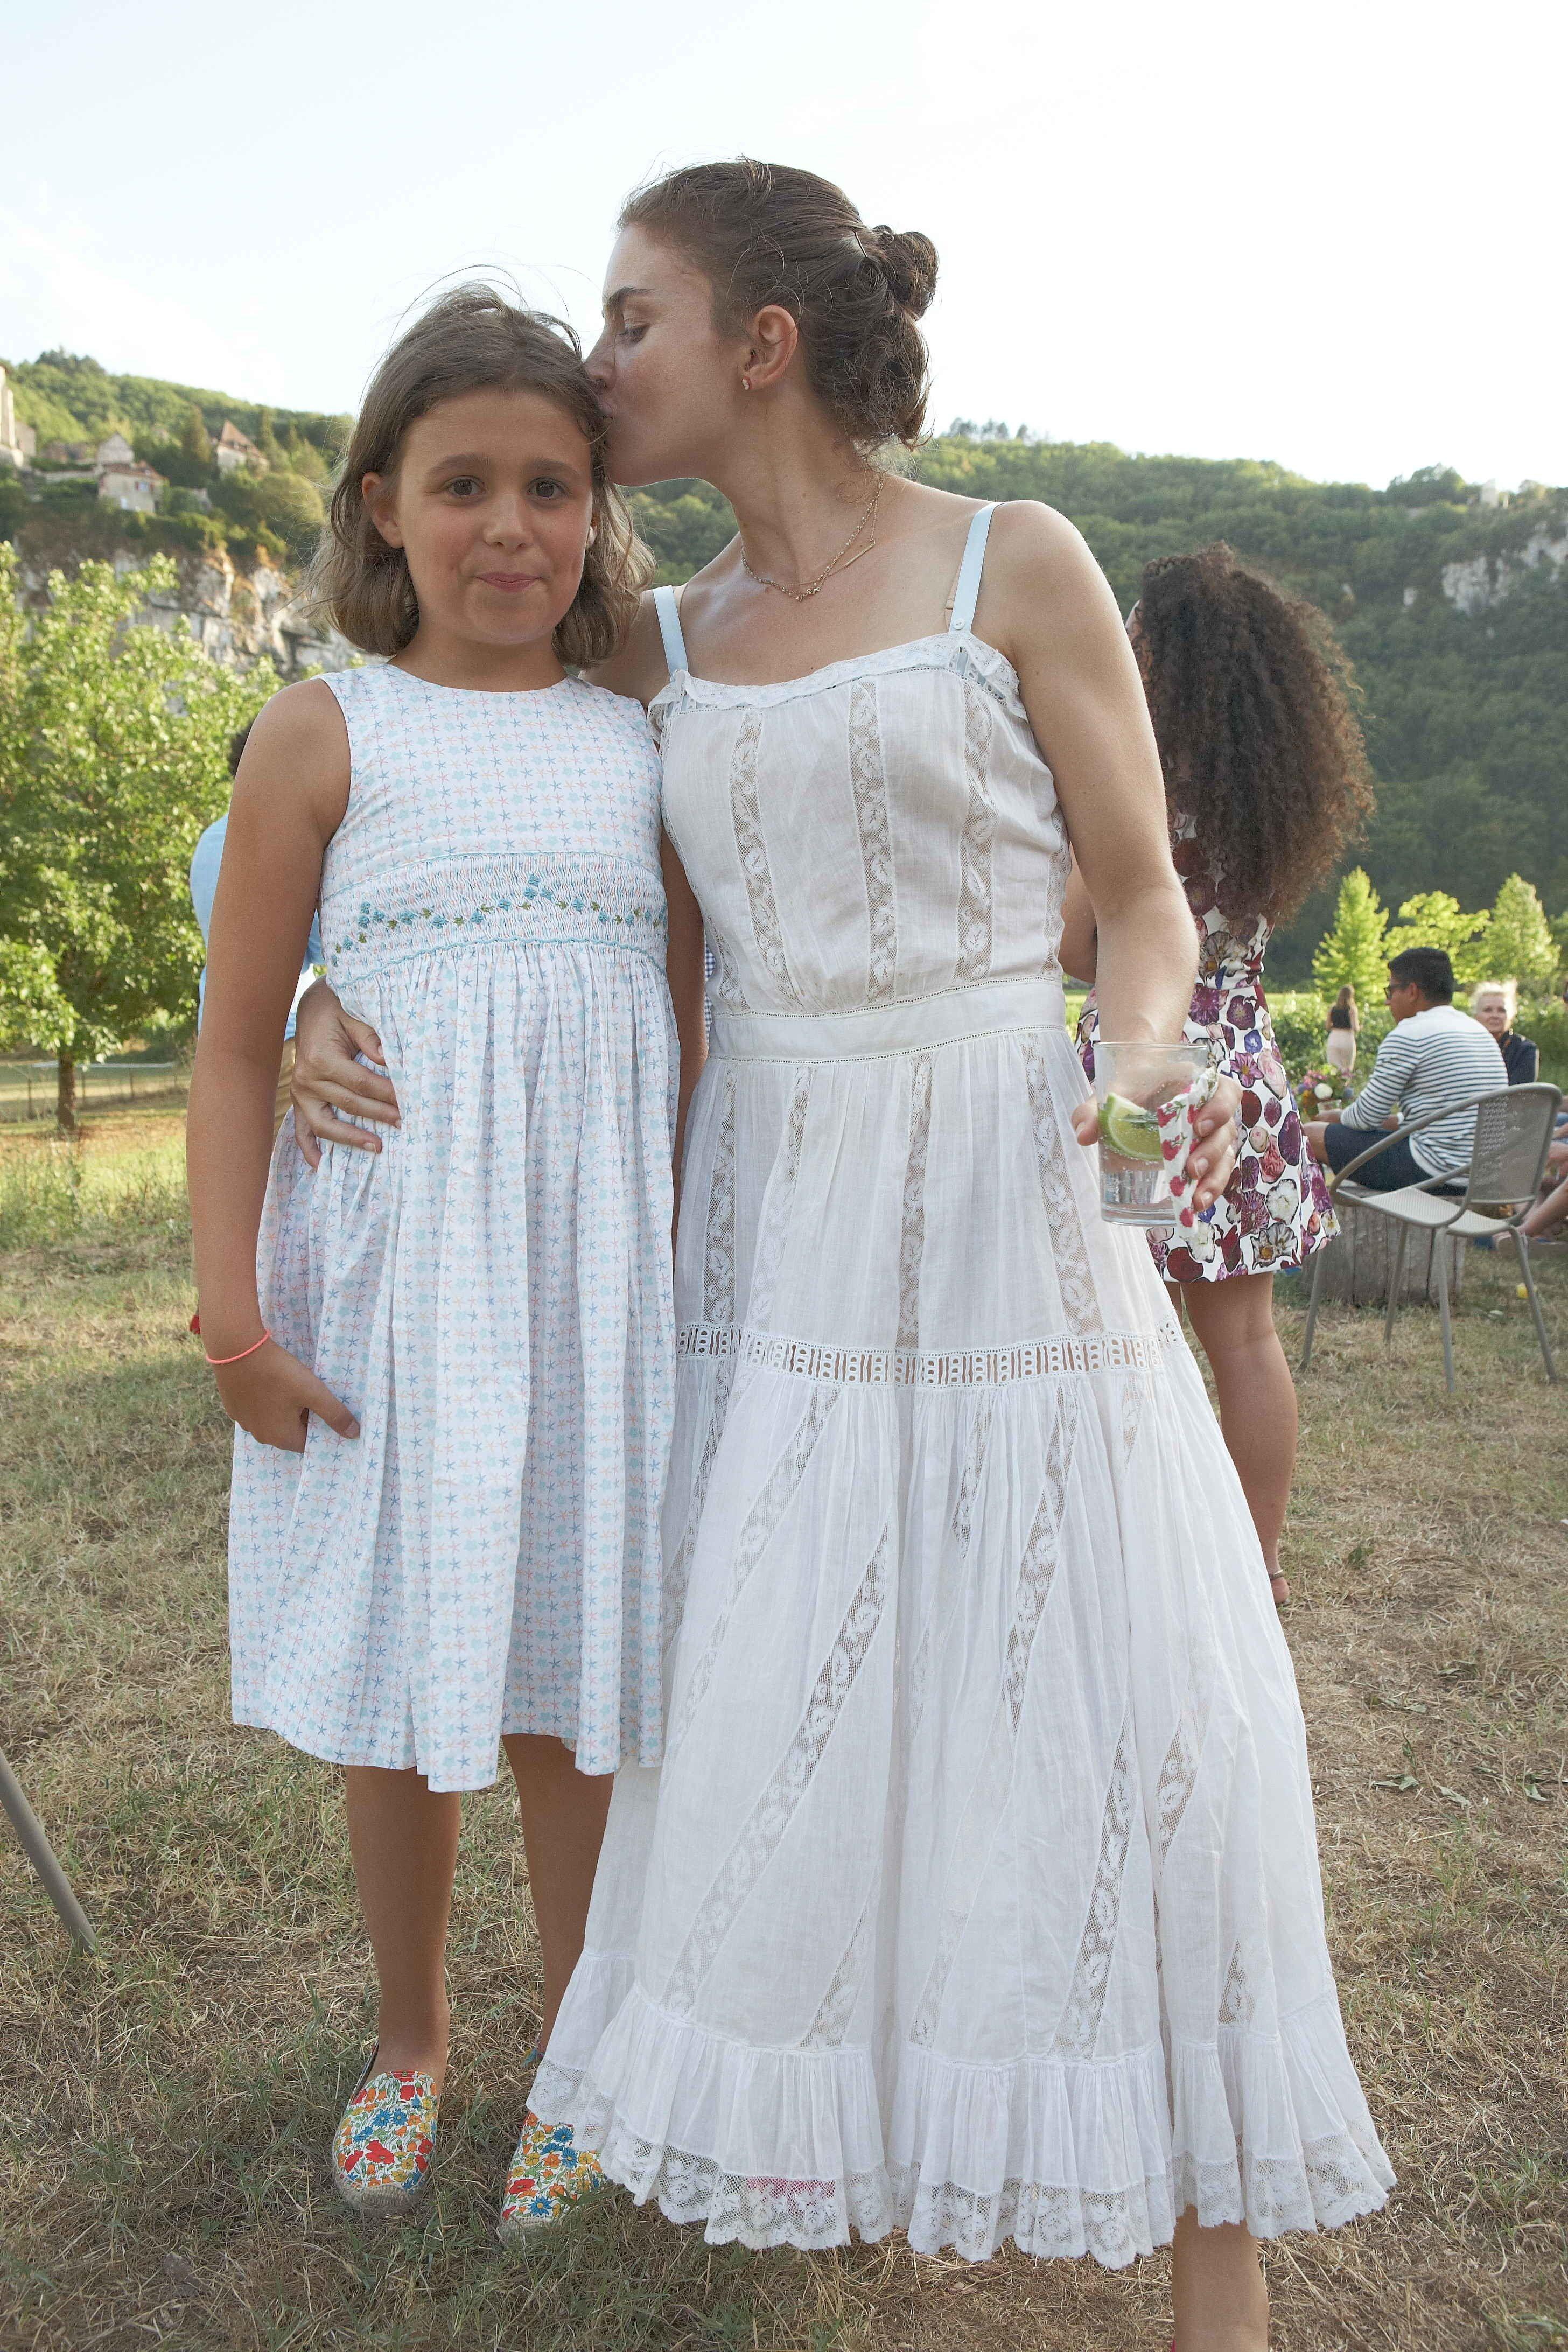 Chloe Malle and Graham Albert\'s Wedding in France | Graham and Wedding